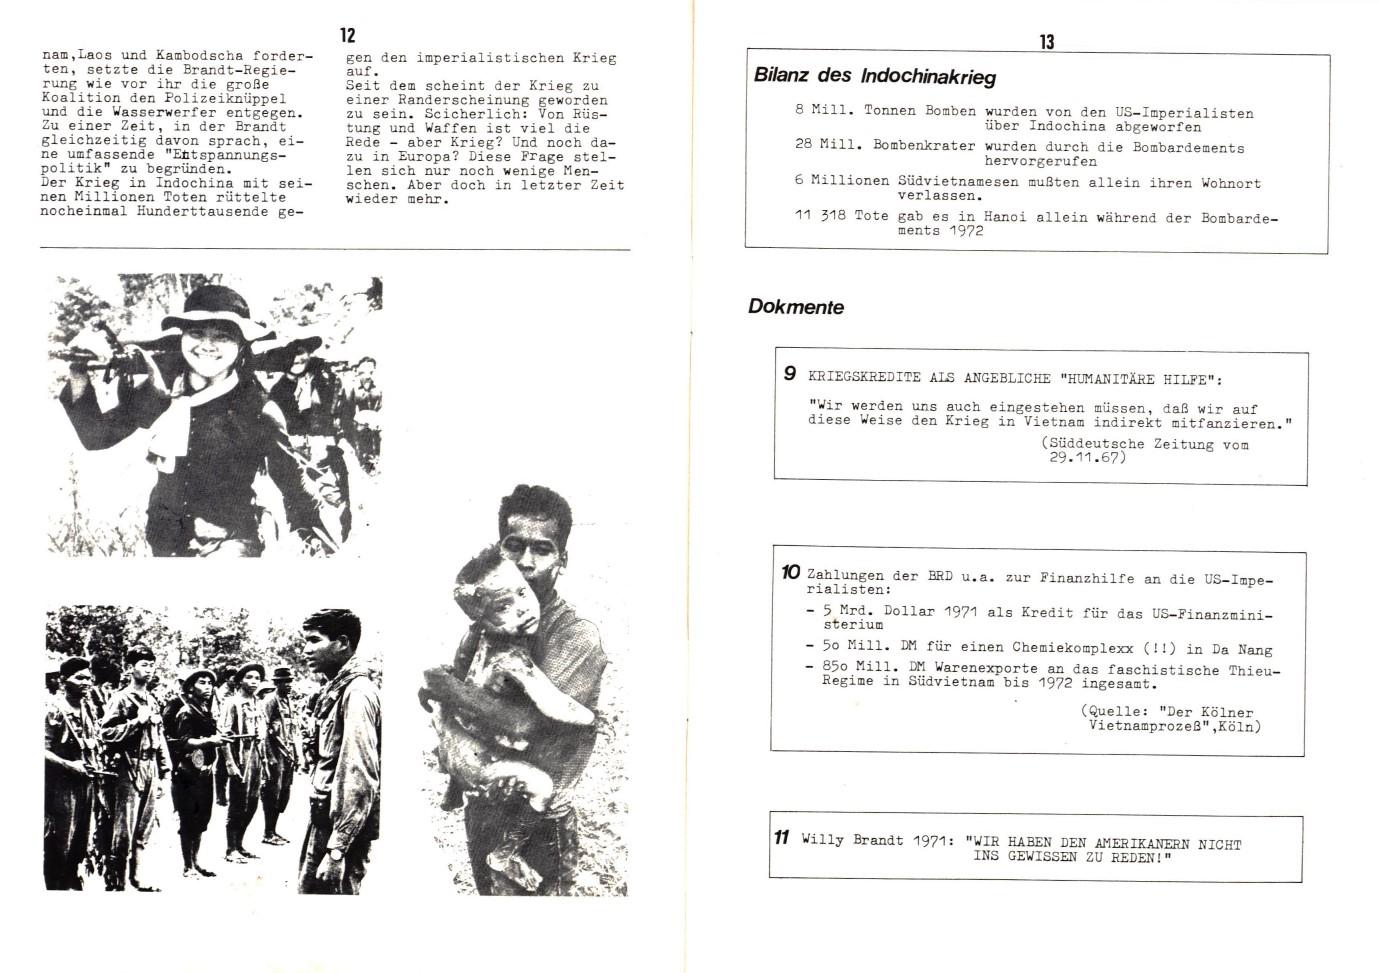 KJVD_1979_Dokumente_zum_Antikriegstag_08